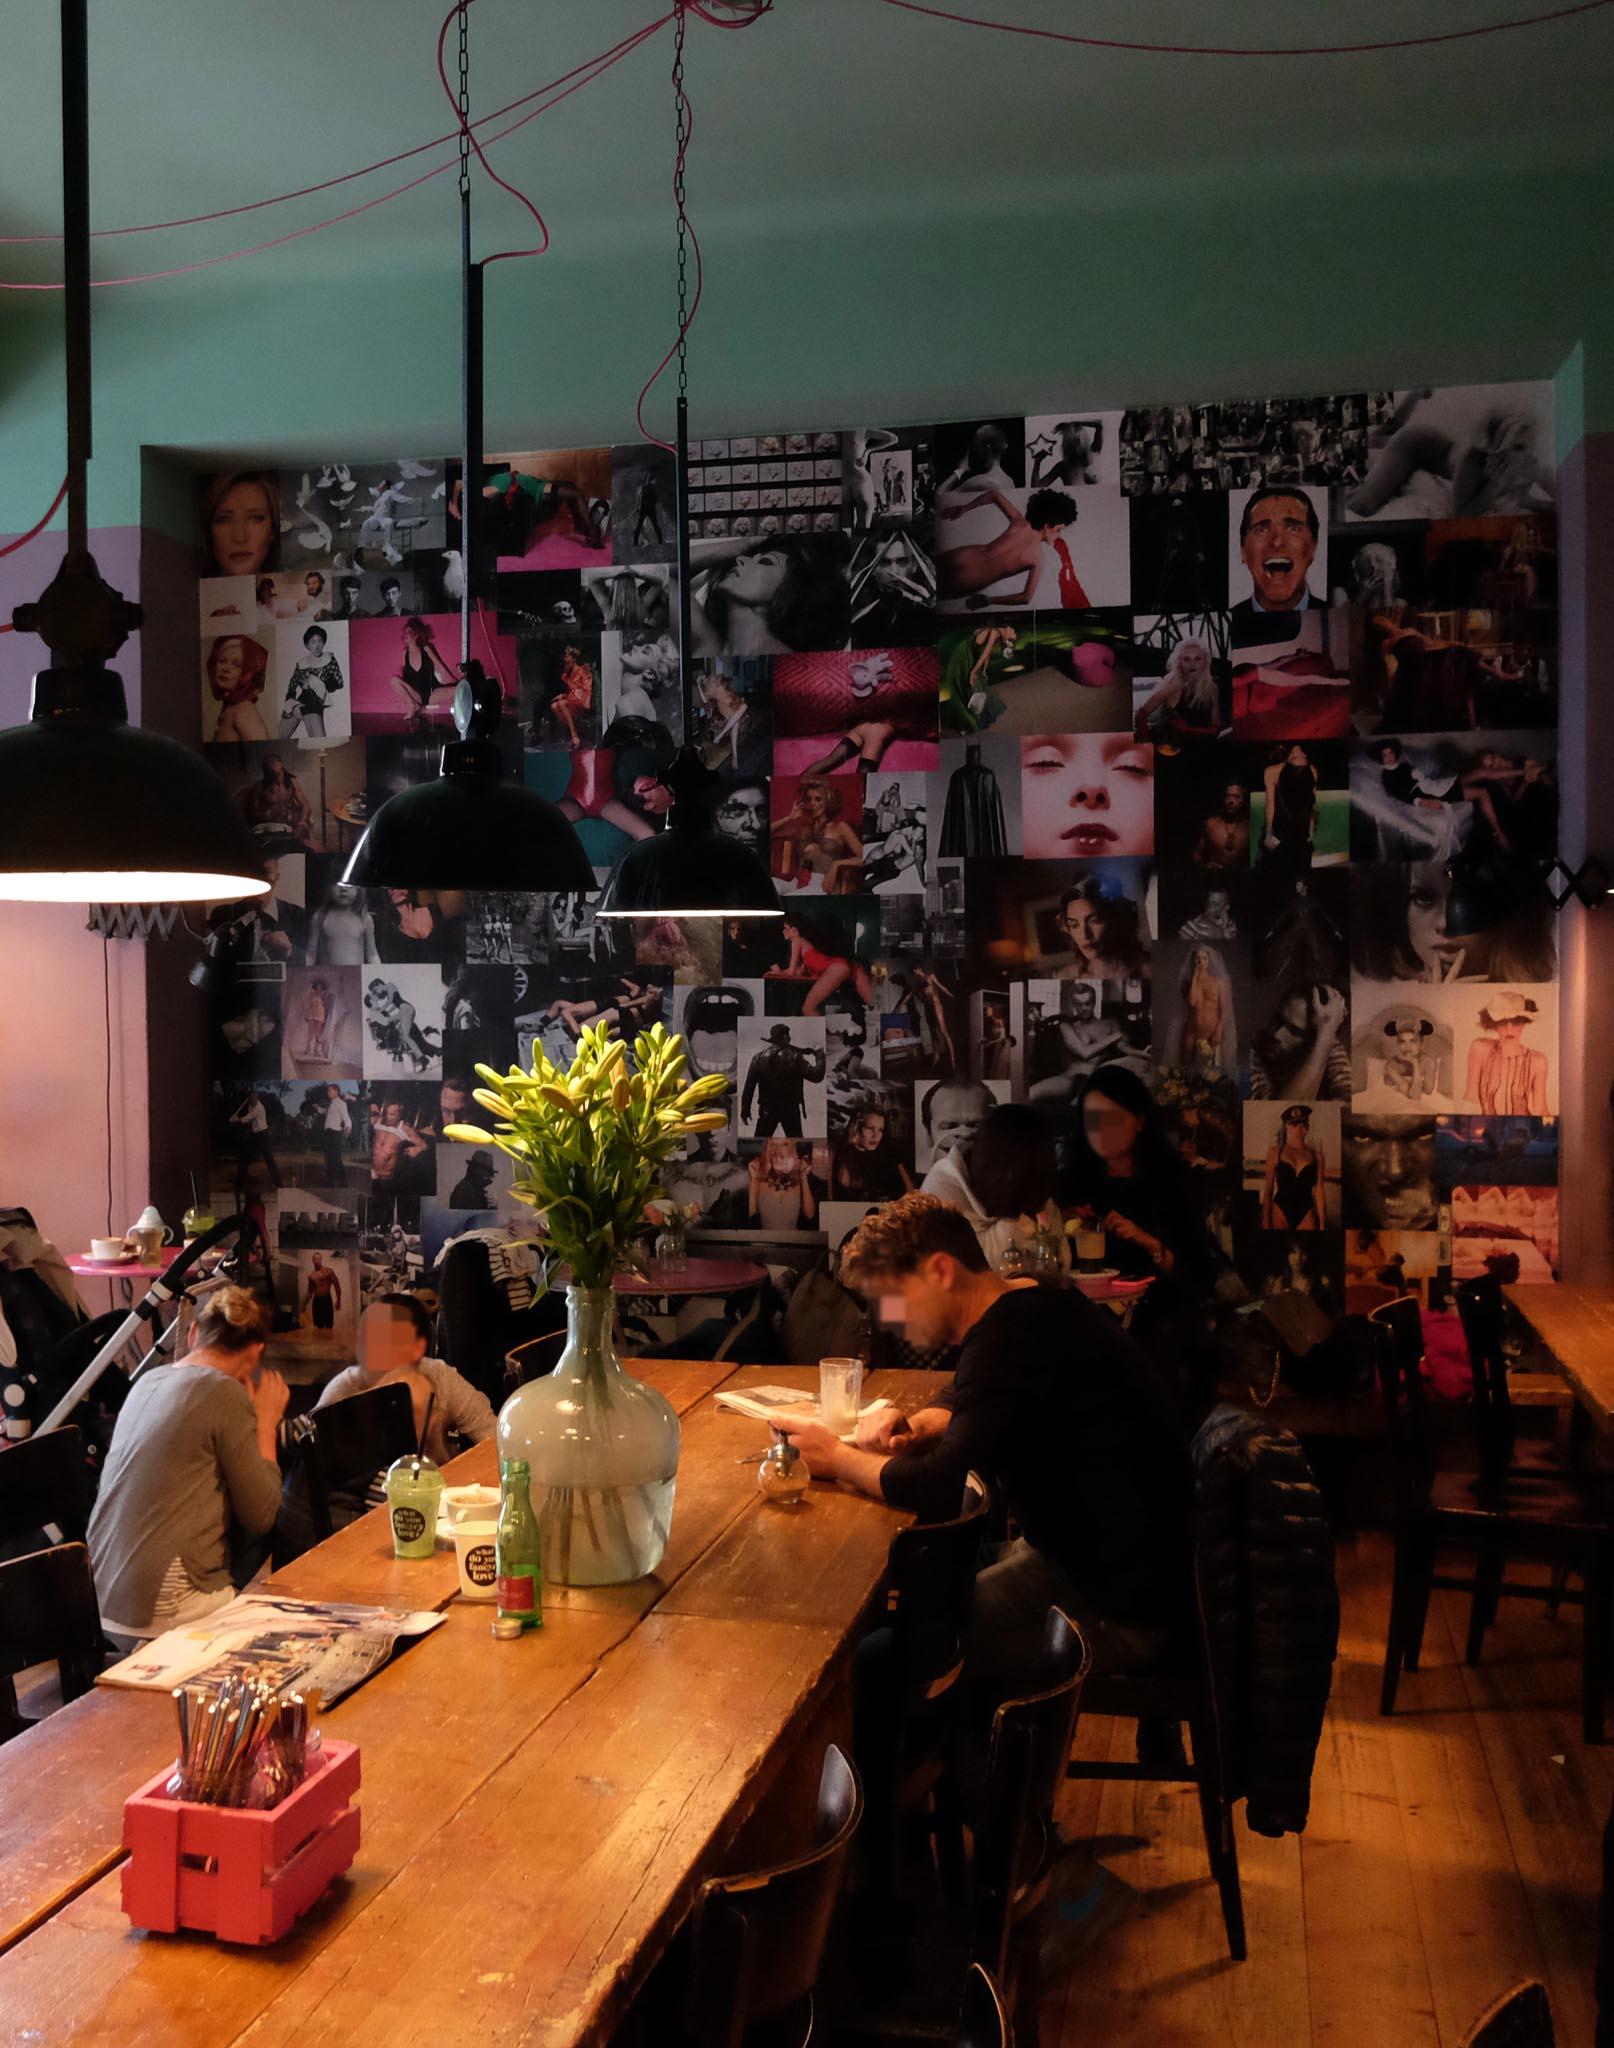 What Do You Fancy Love Berlin Cafe